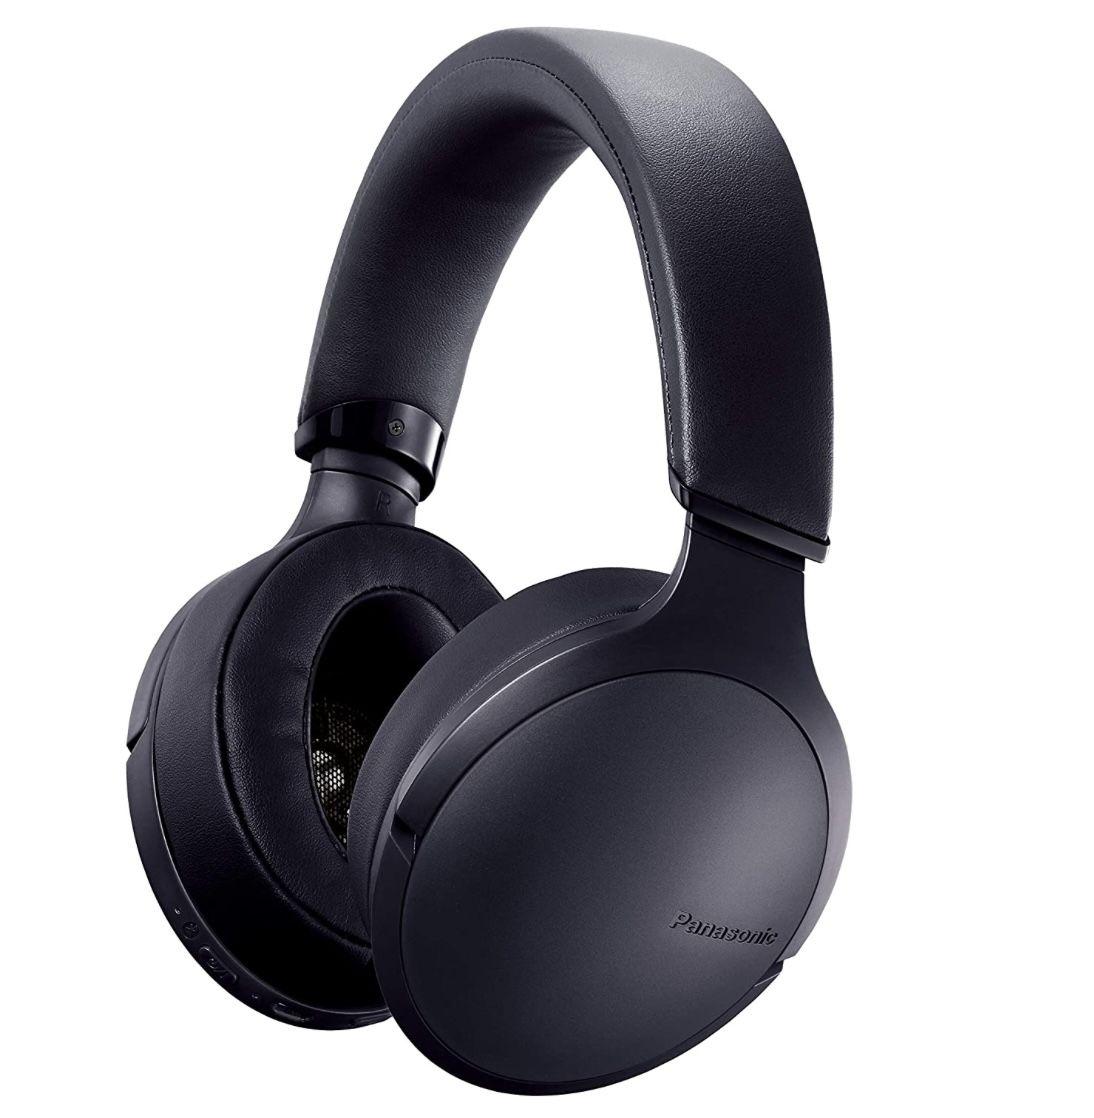 Panasonic RP-HD305BE-K Bluetooth Kopfhörer mit 24h Akkulaufzeit für 69,99€ (statt 130€)